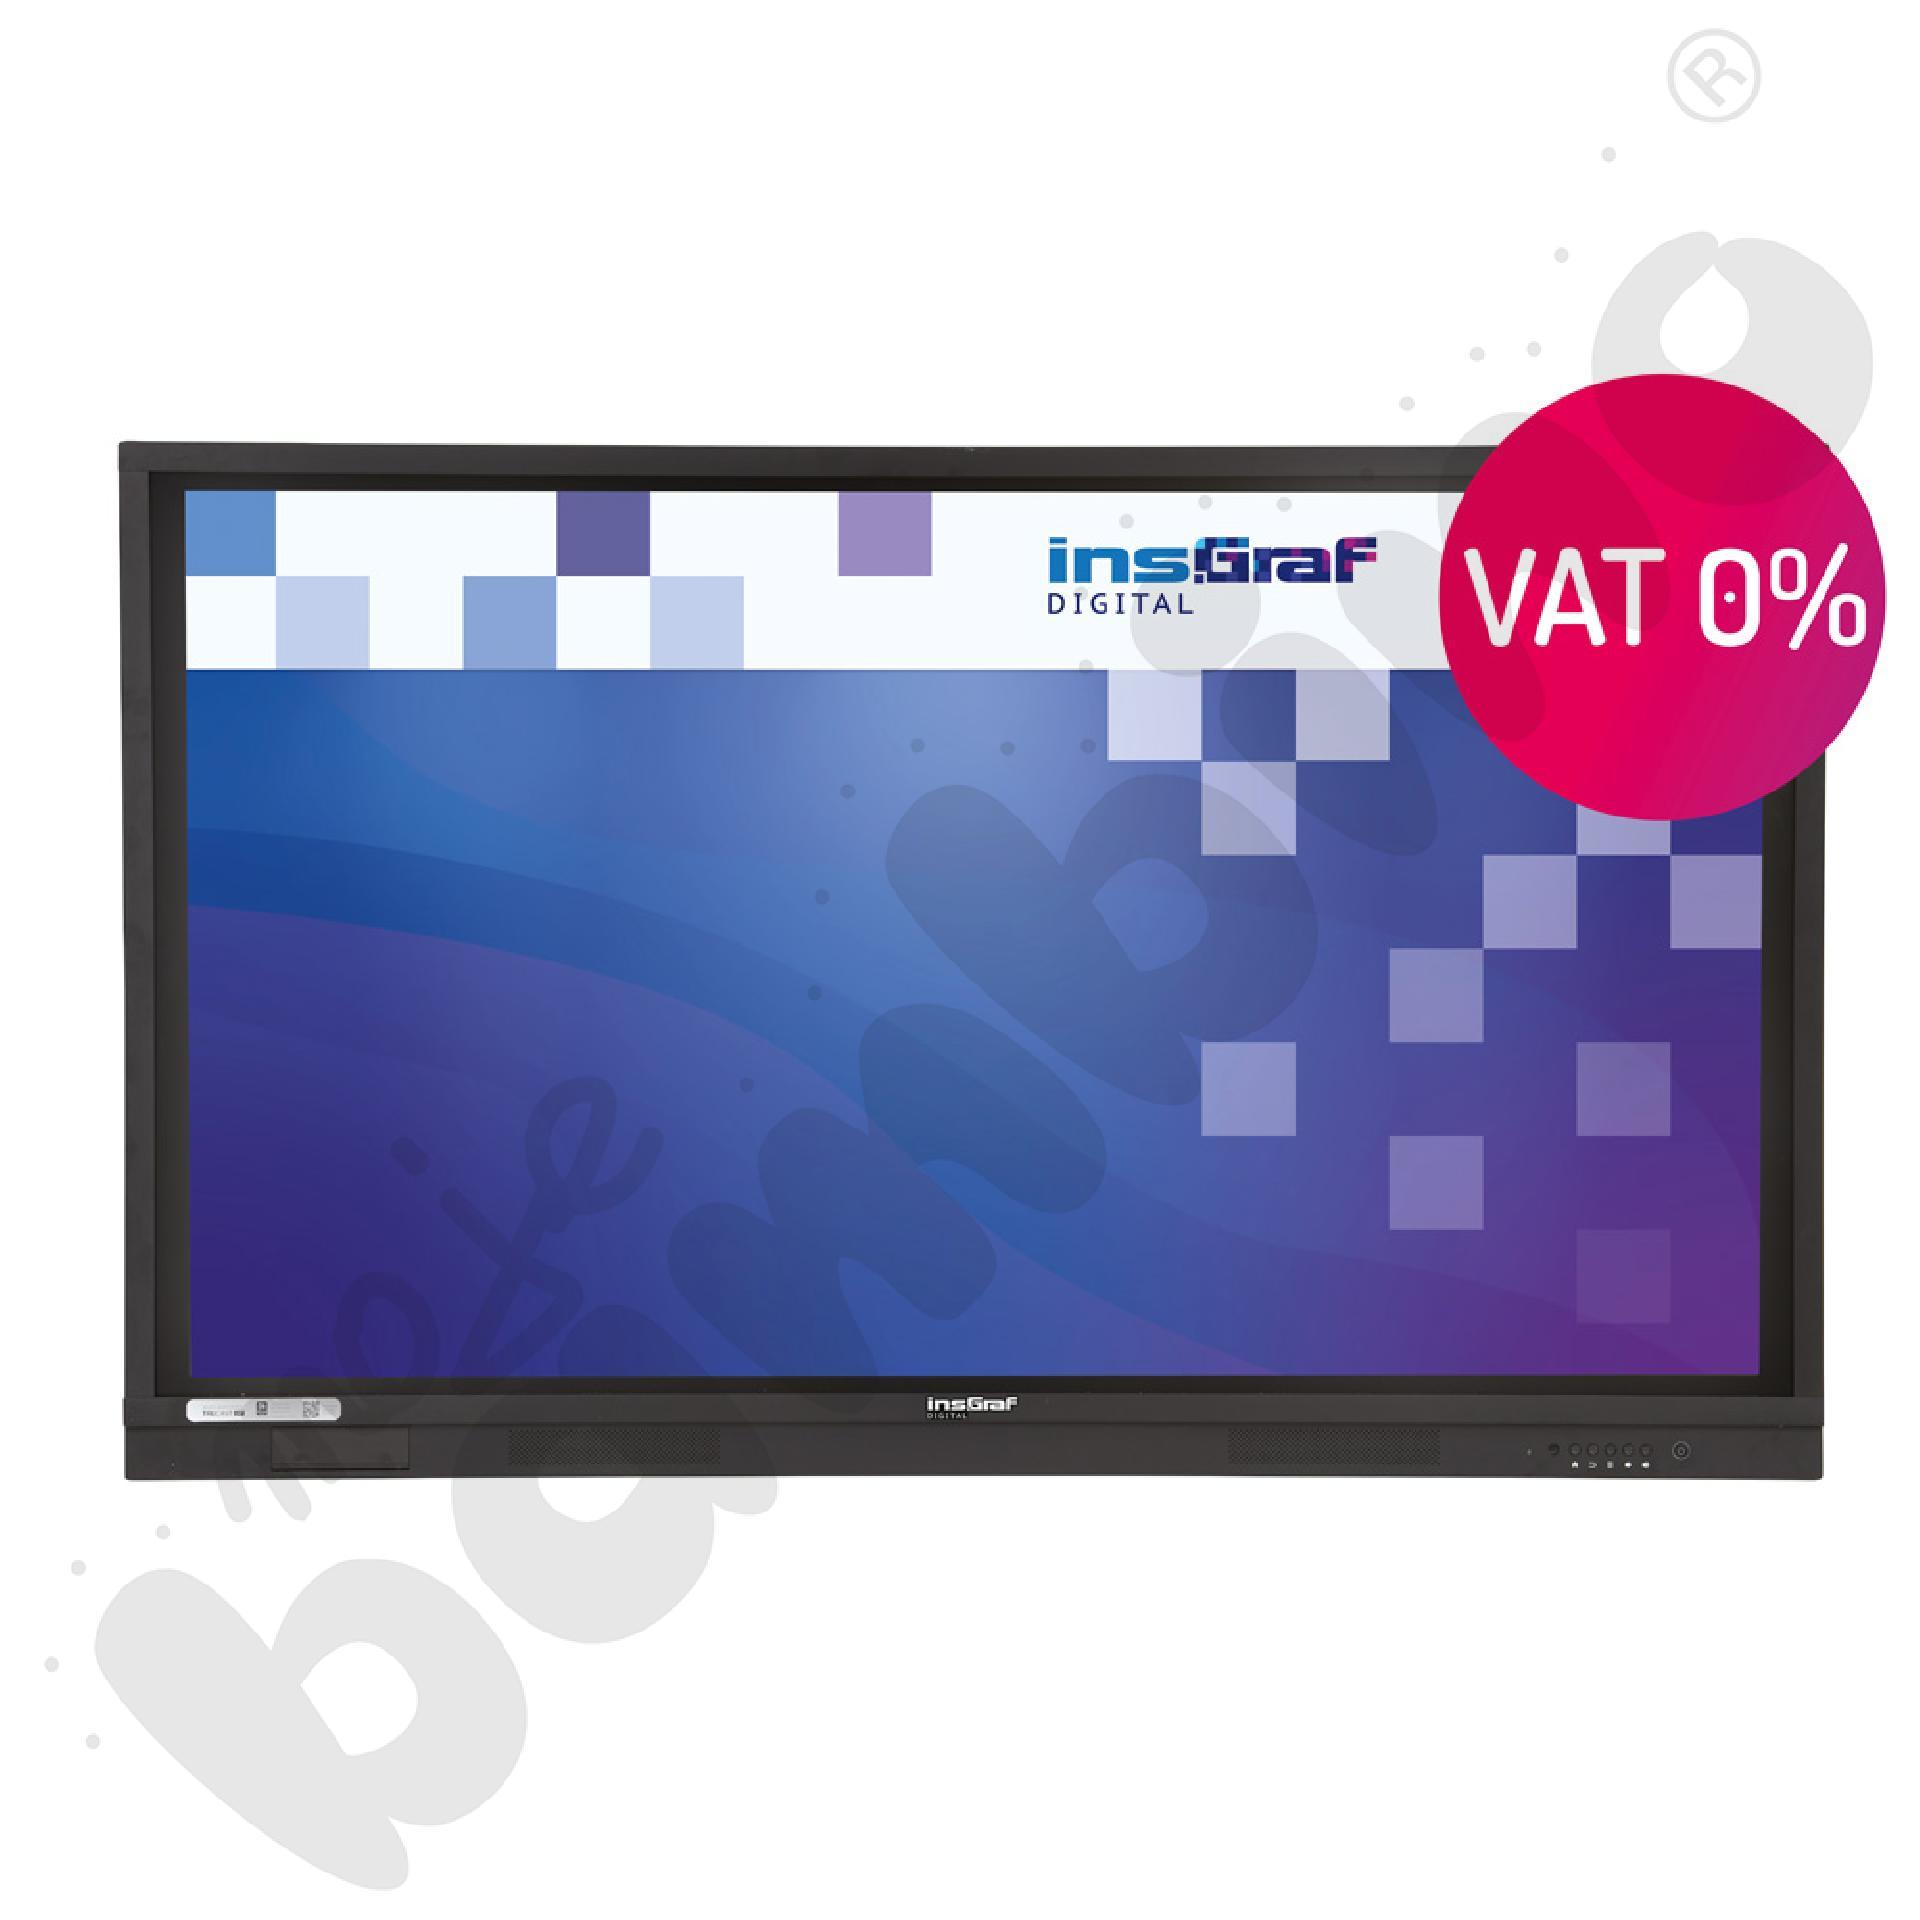 Monitor interaktywny insGraf DIGITAL 65 - 4K UHD